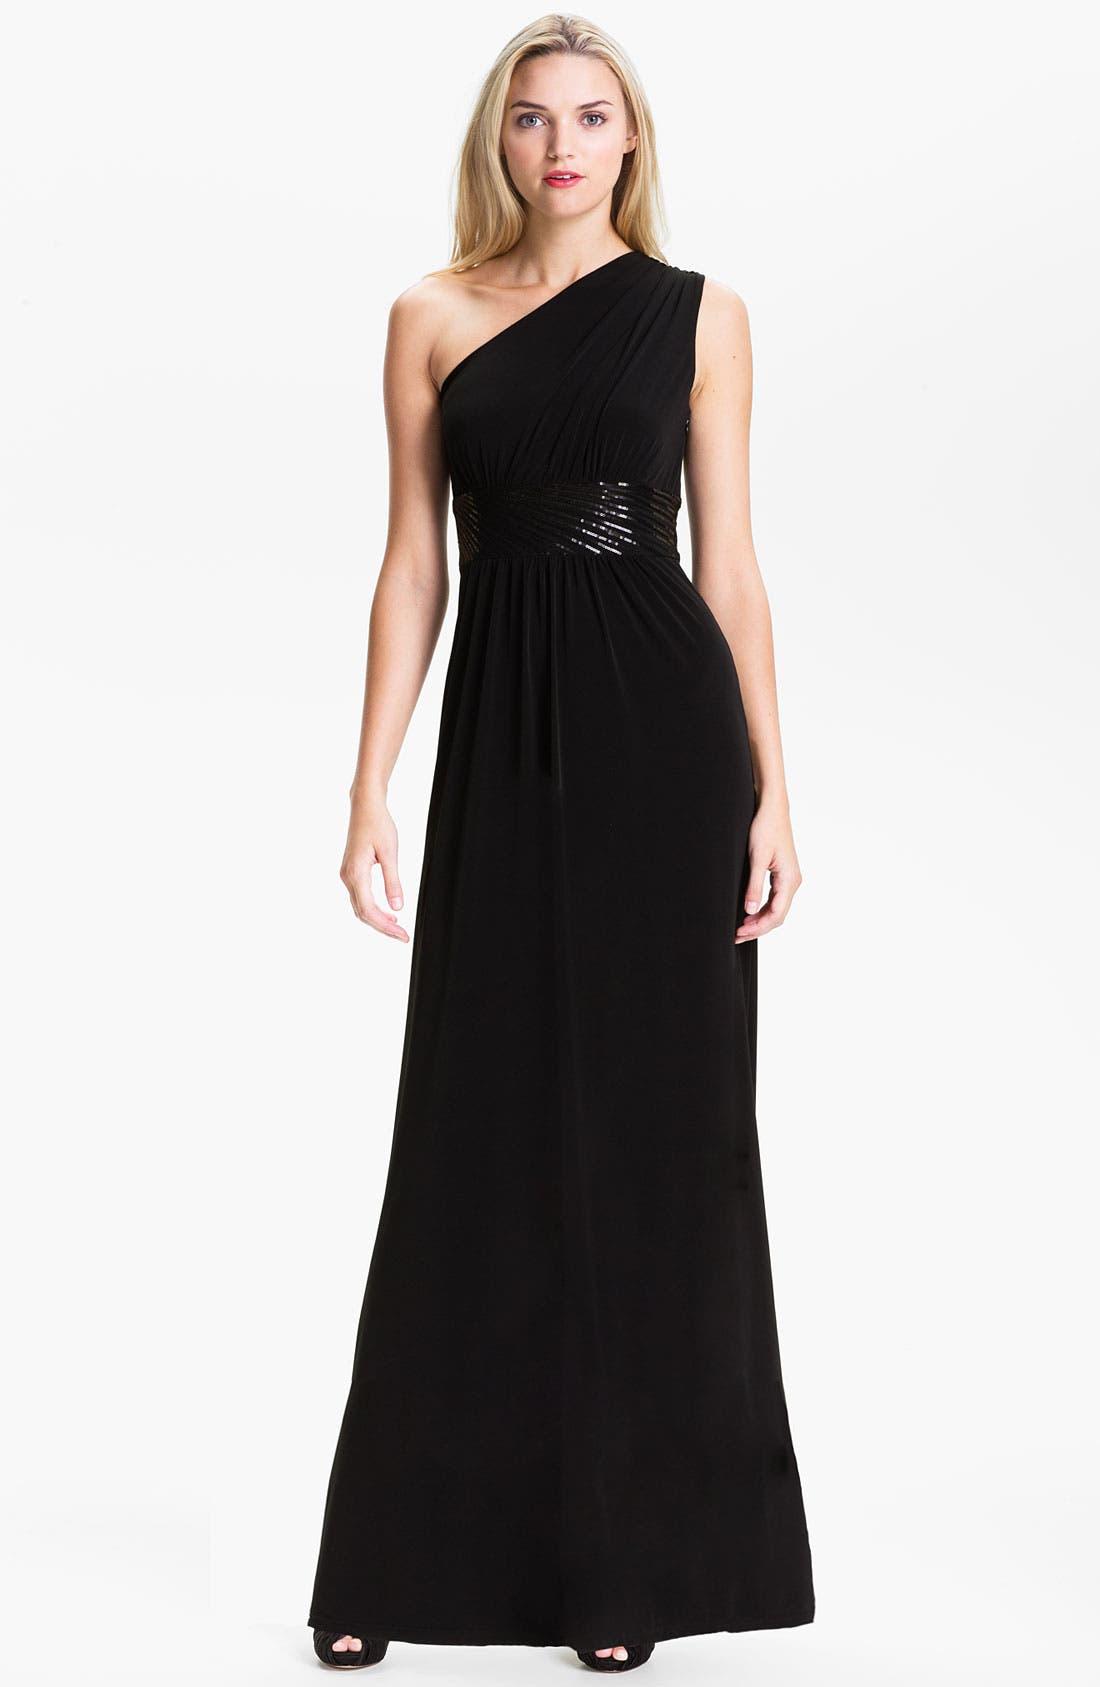 Alternate Image 1 Selected - Calvin Klein Sequin Waist One Shoulder Jersey Gown